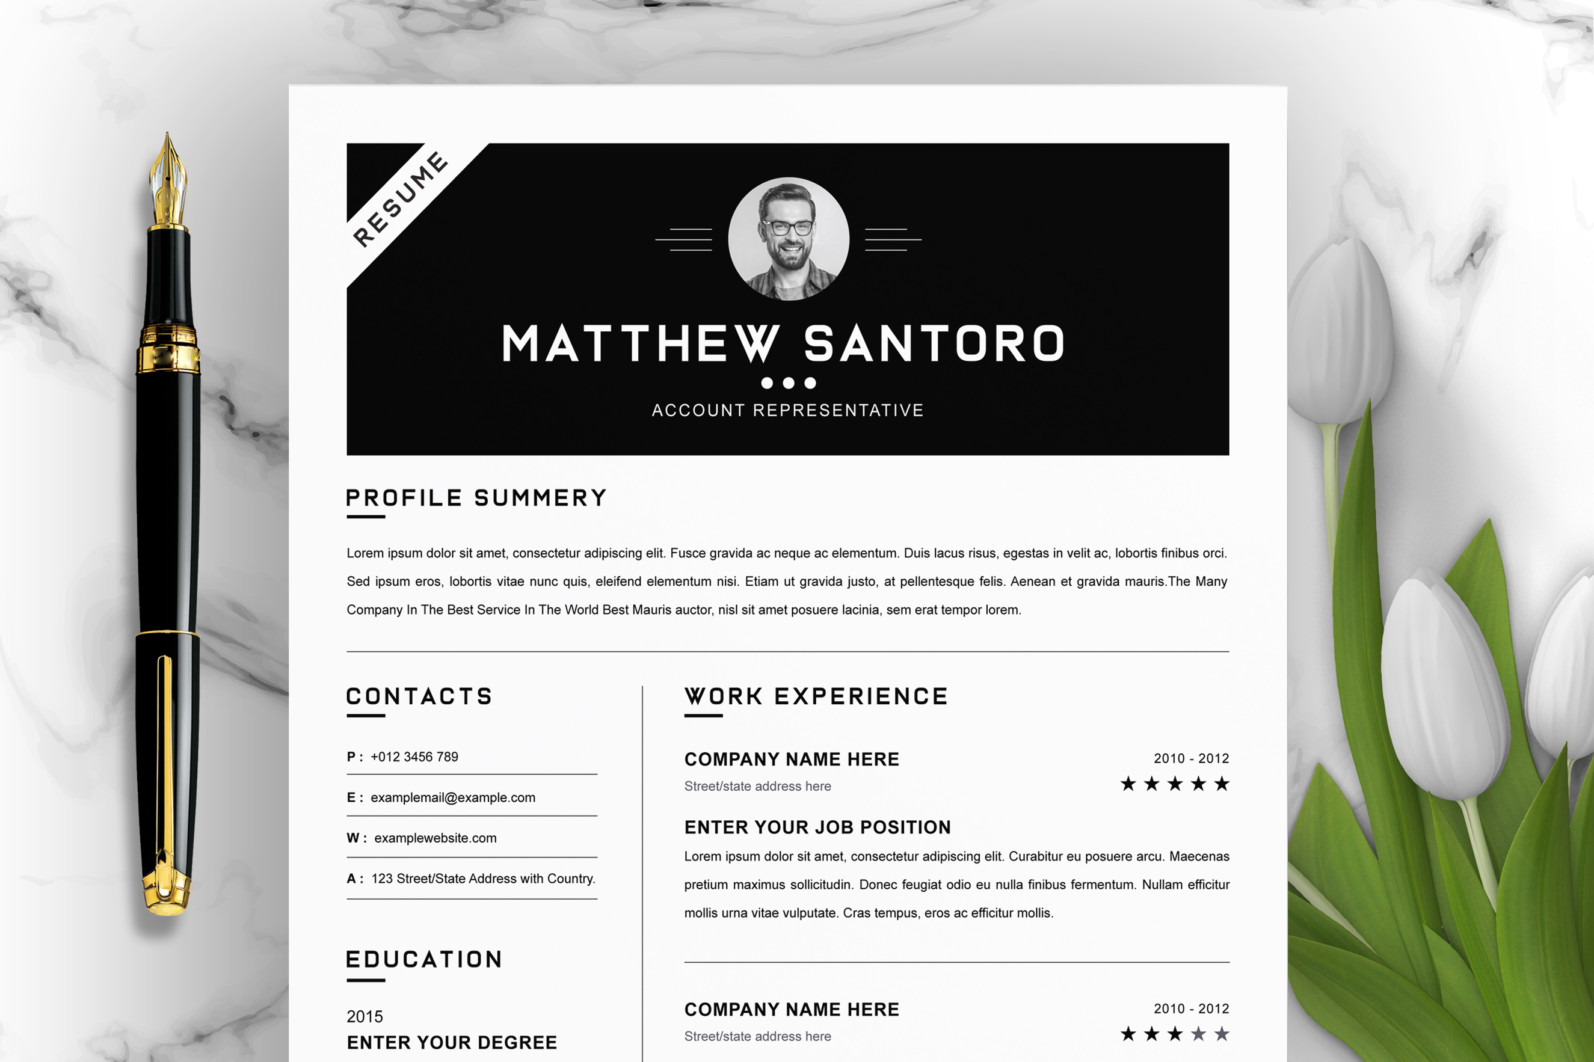 Simple Resume Design 2021 - Main Photo 9 scaled -